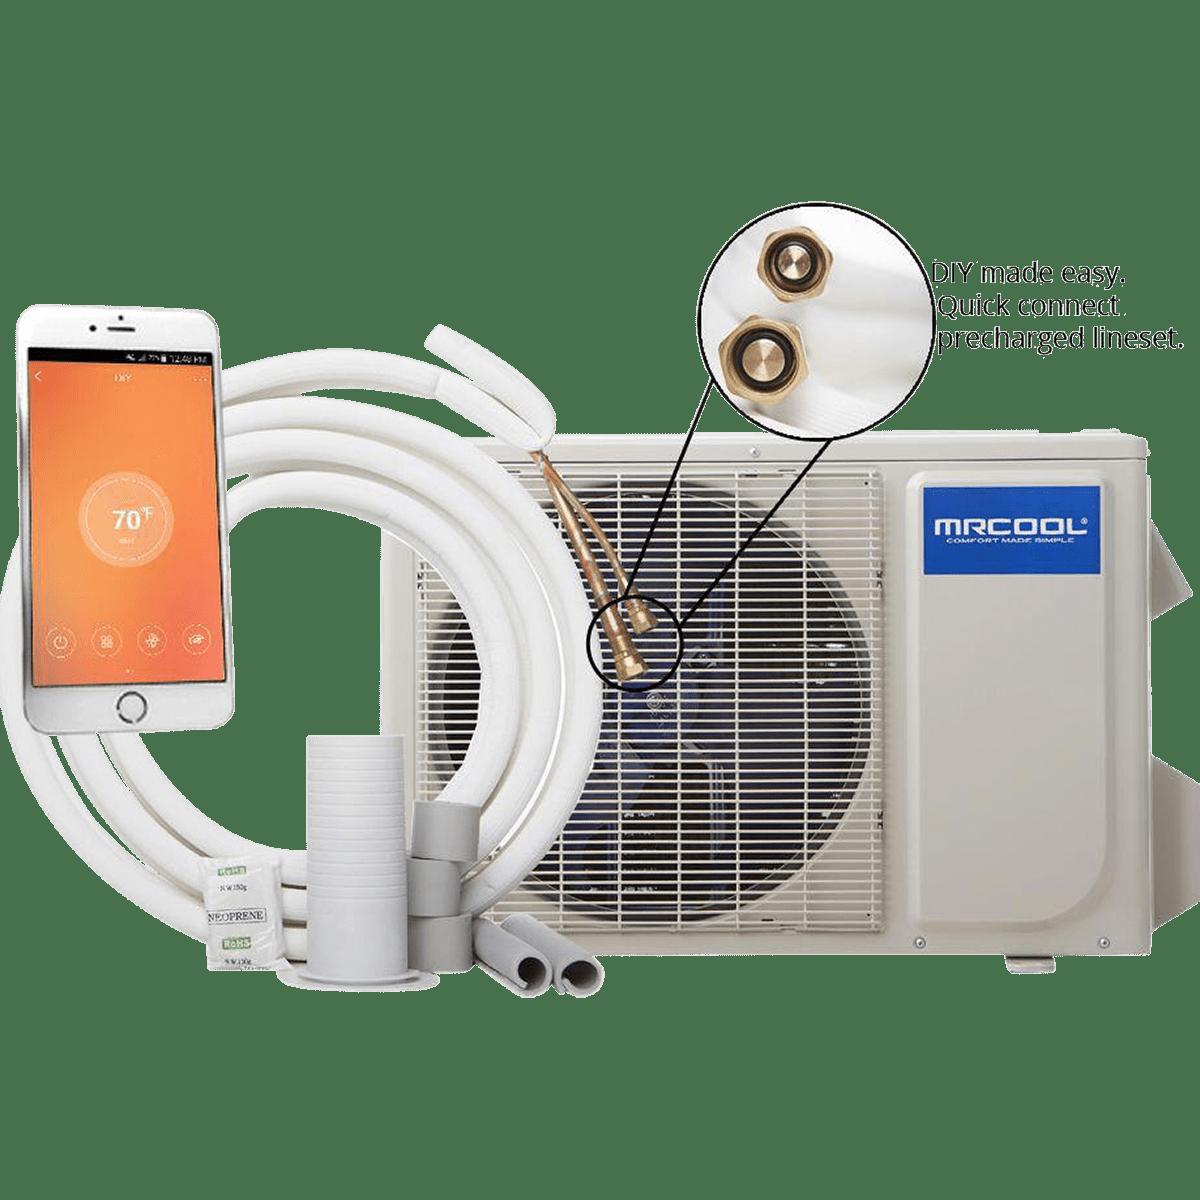 MRCOOL DIY 18,000 BTU 230V Mini Split Heat Pump | Sylvane